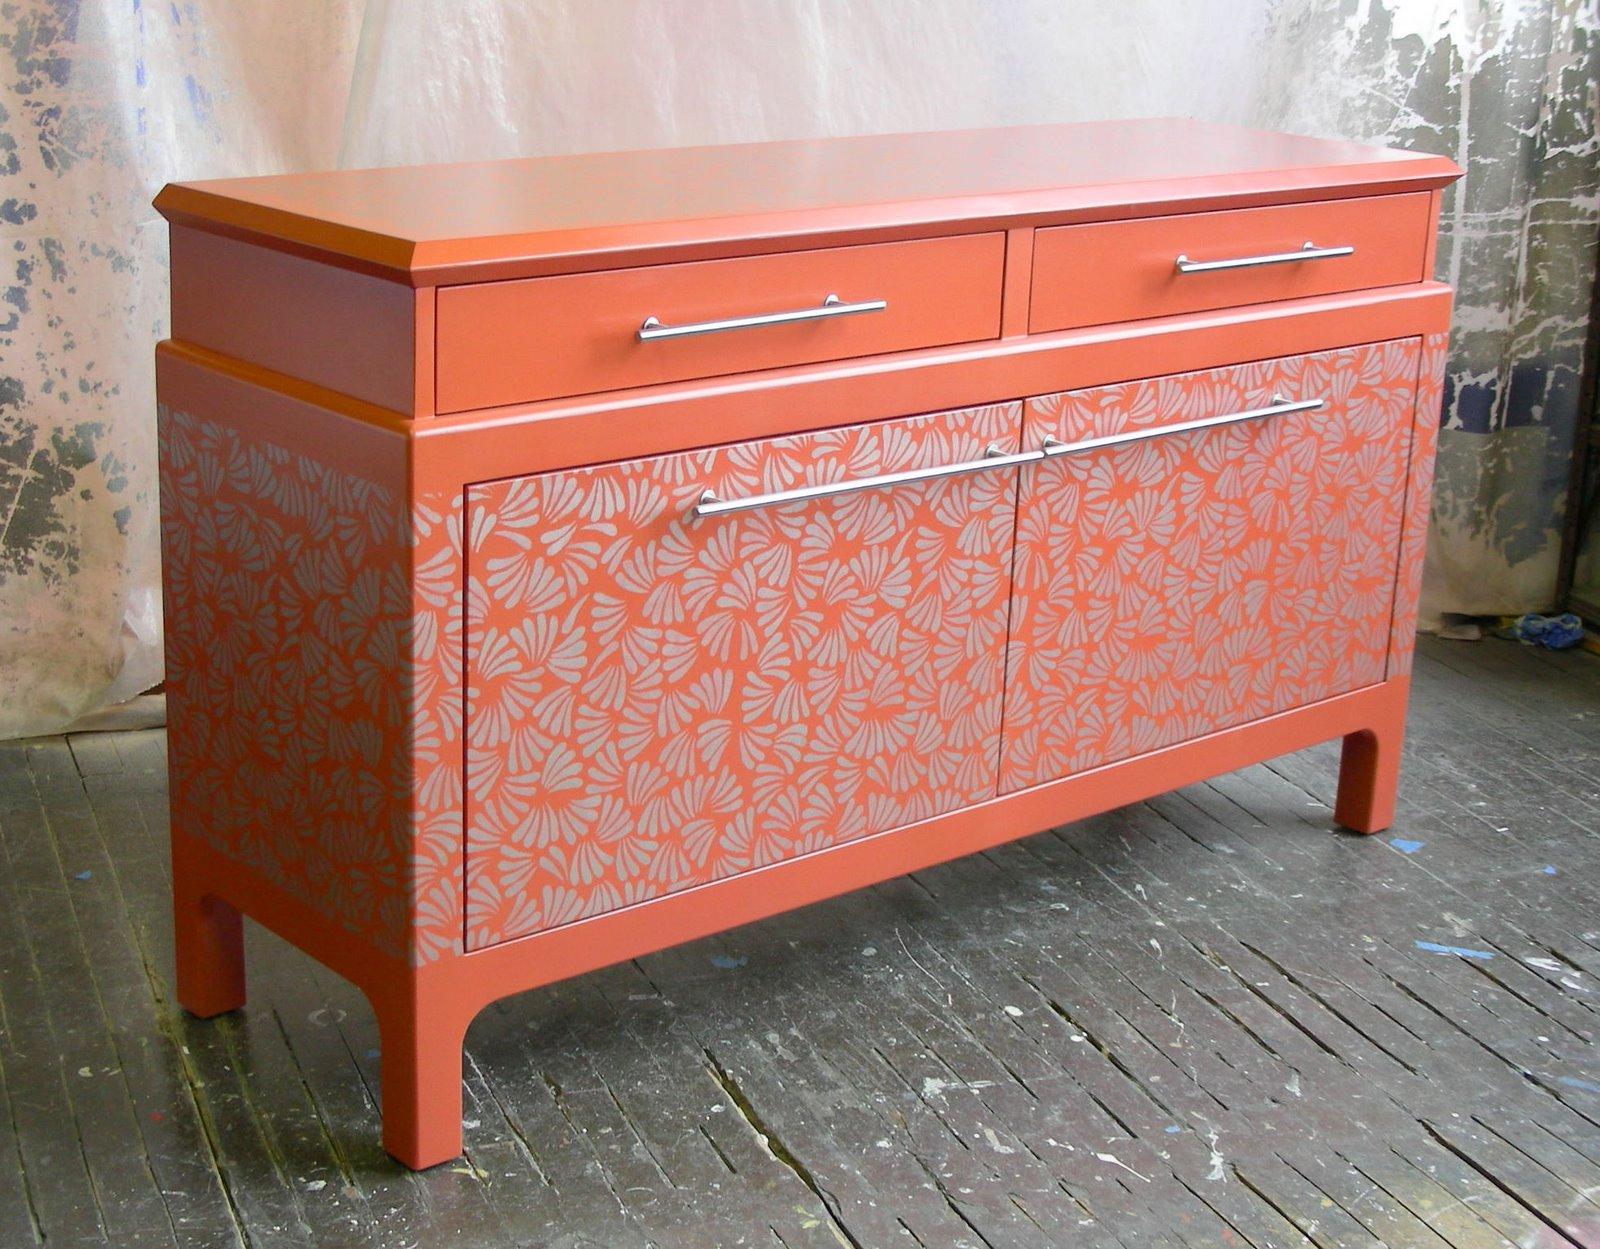 Sydney Barton - Painted Furniture: Orange Asian Style Buffet